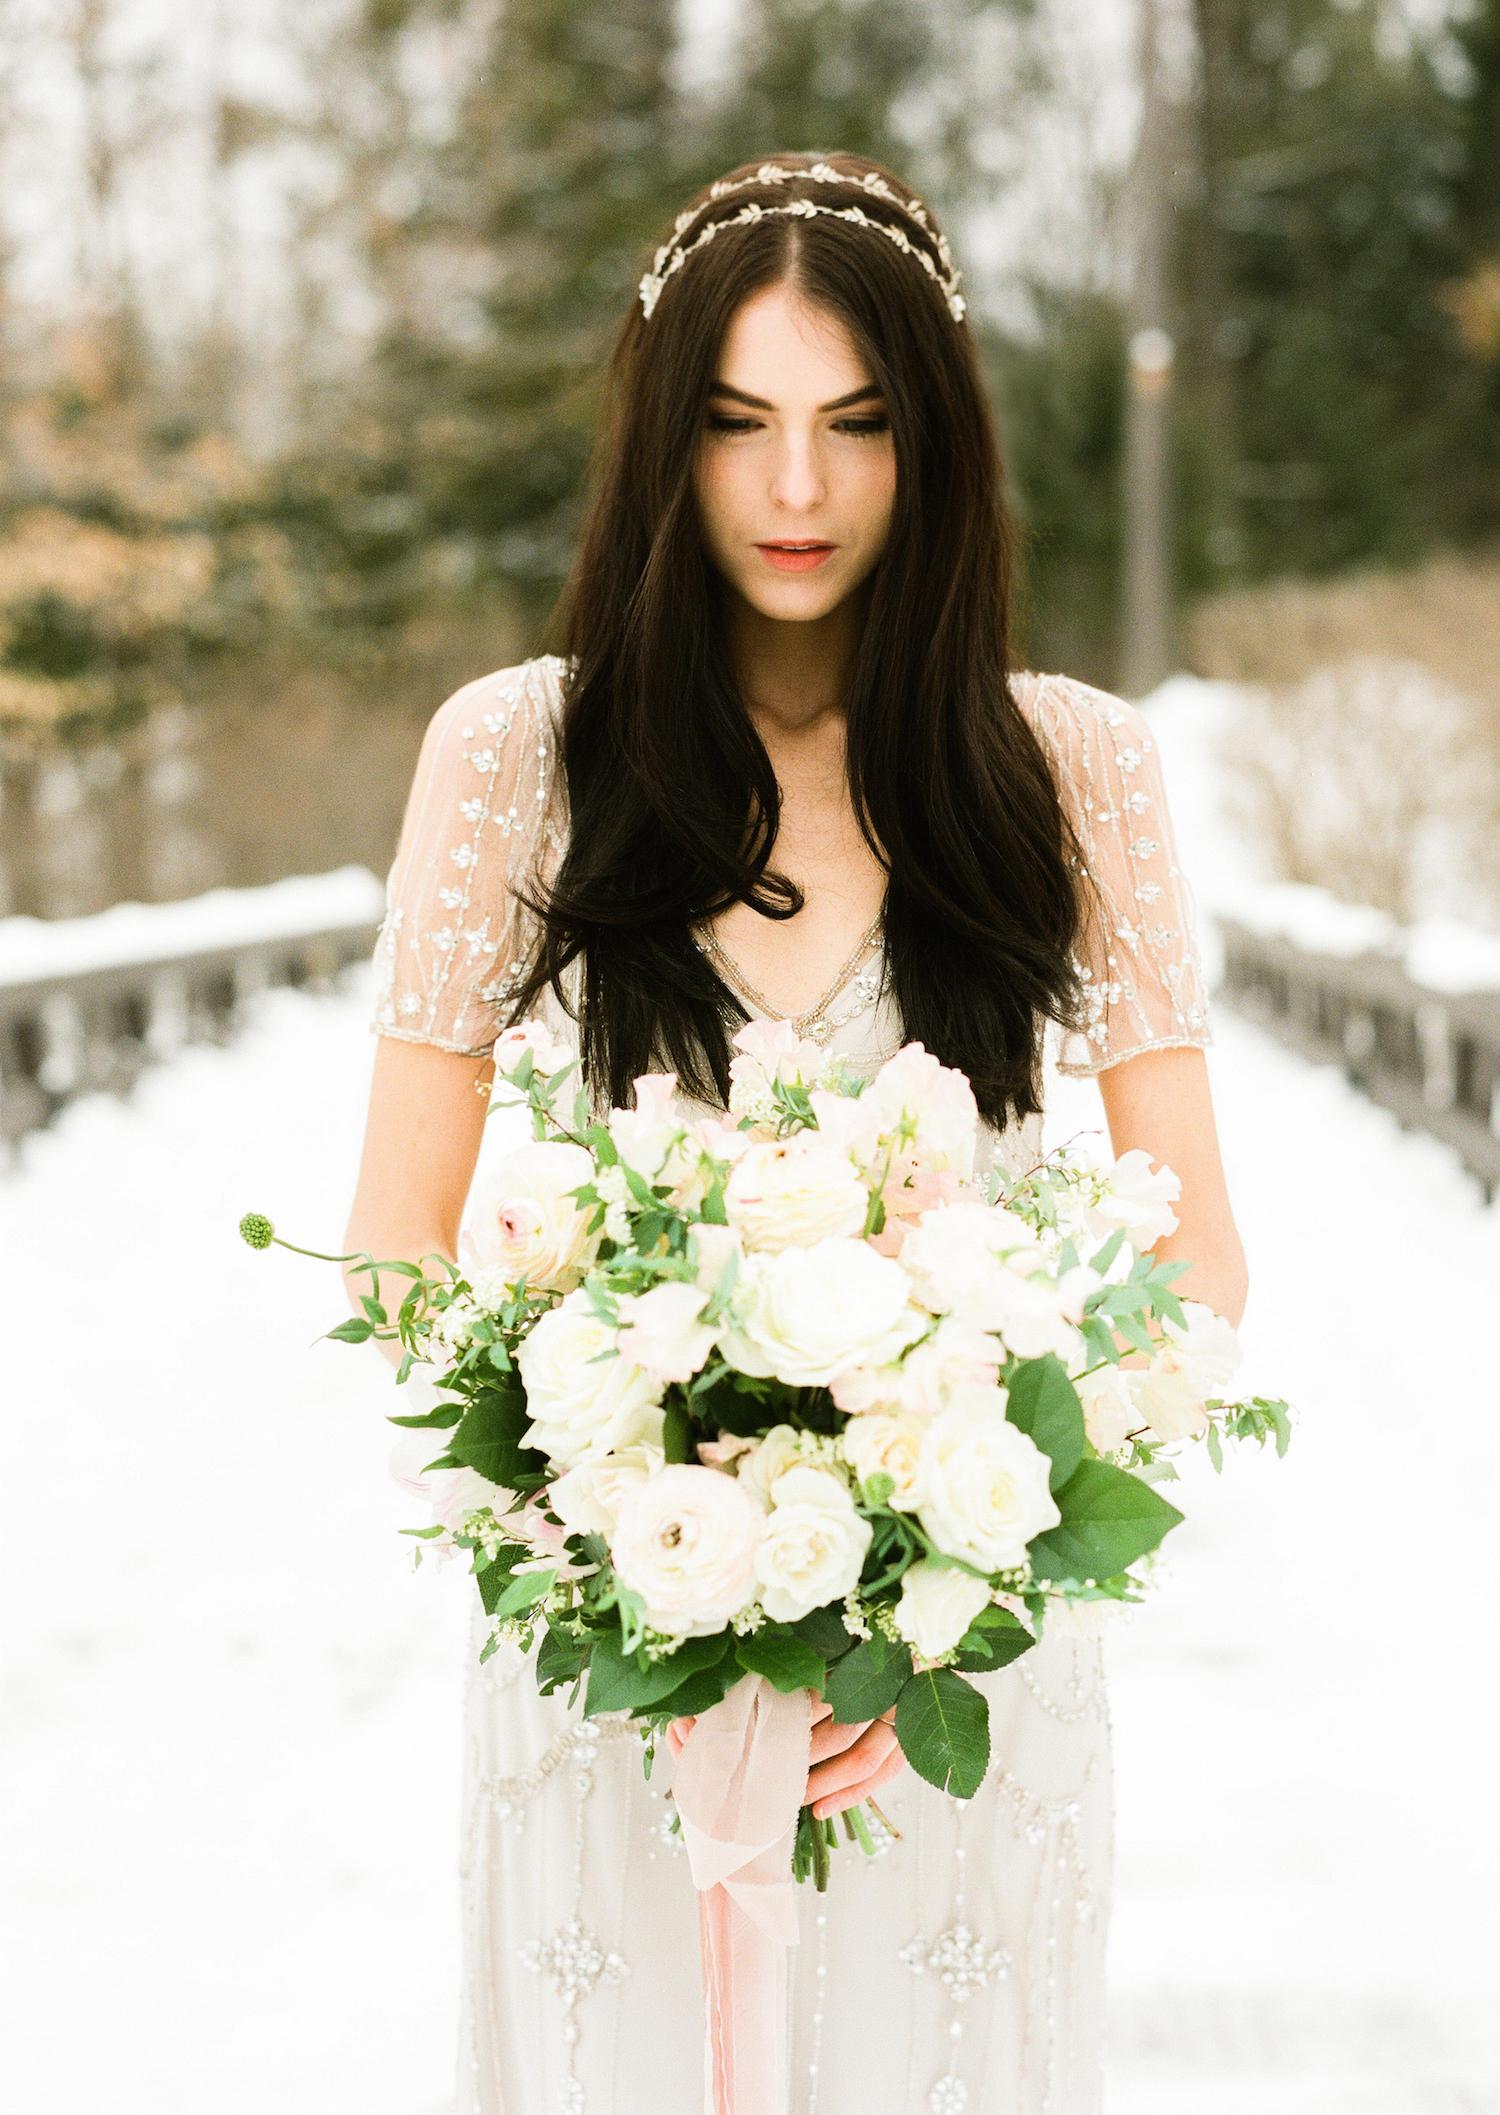 Winter Editorial-JennyPackham-LindsayMaddenPhotography-18 copy.jpg